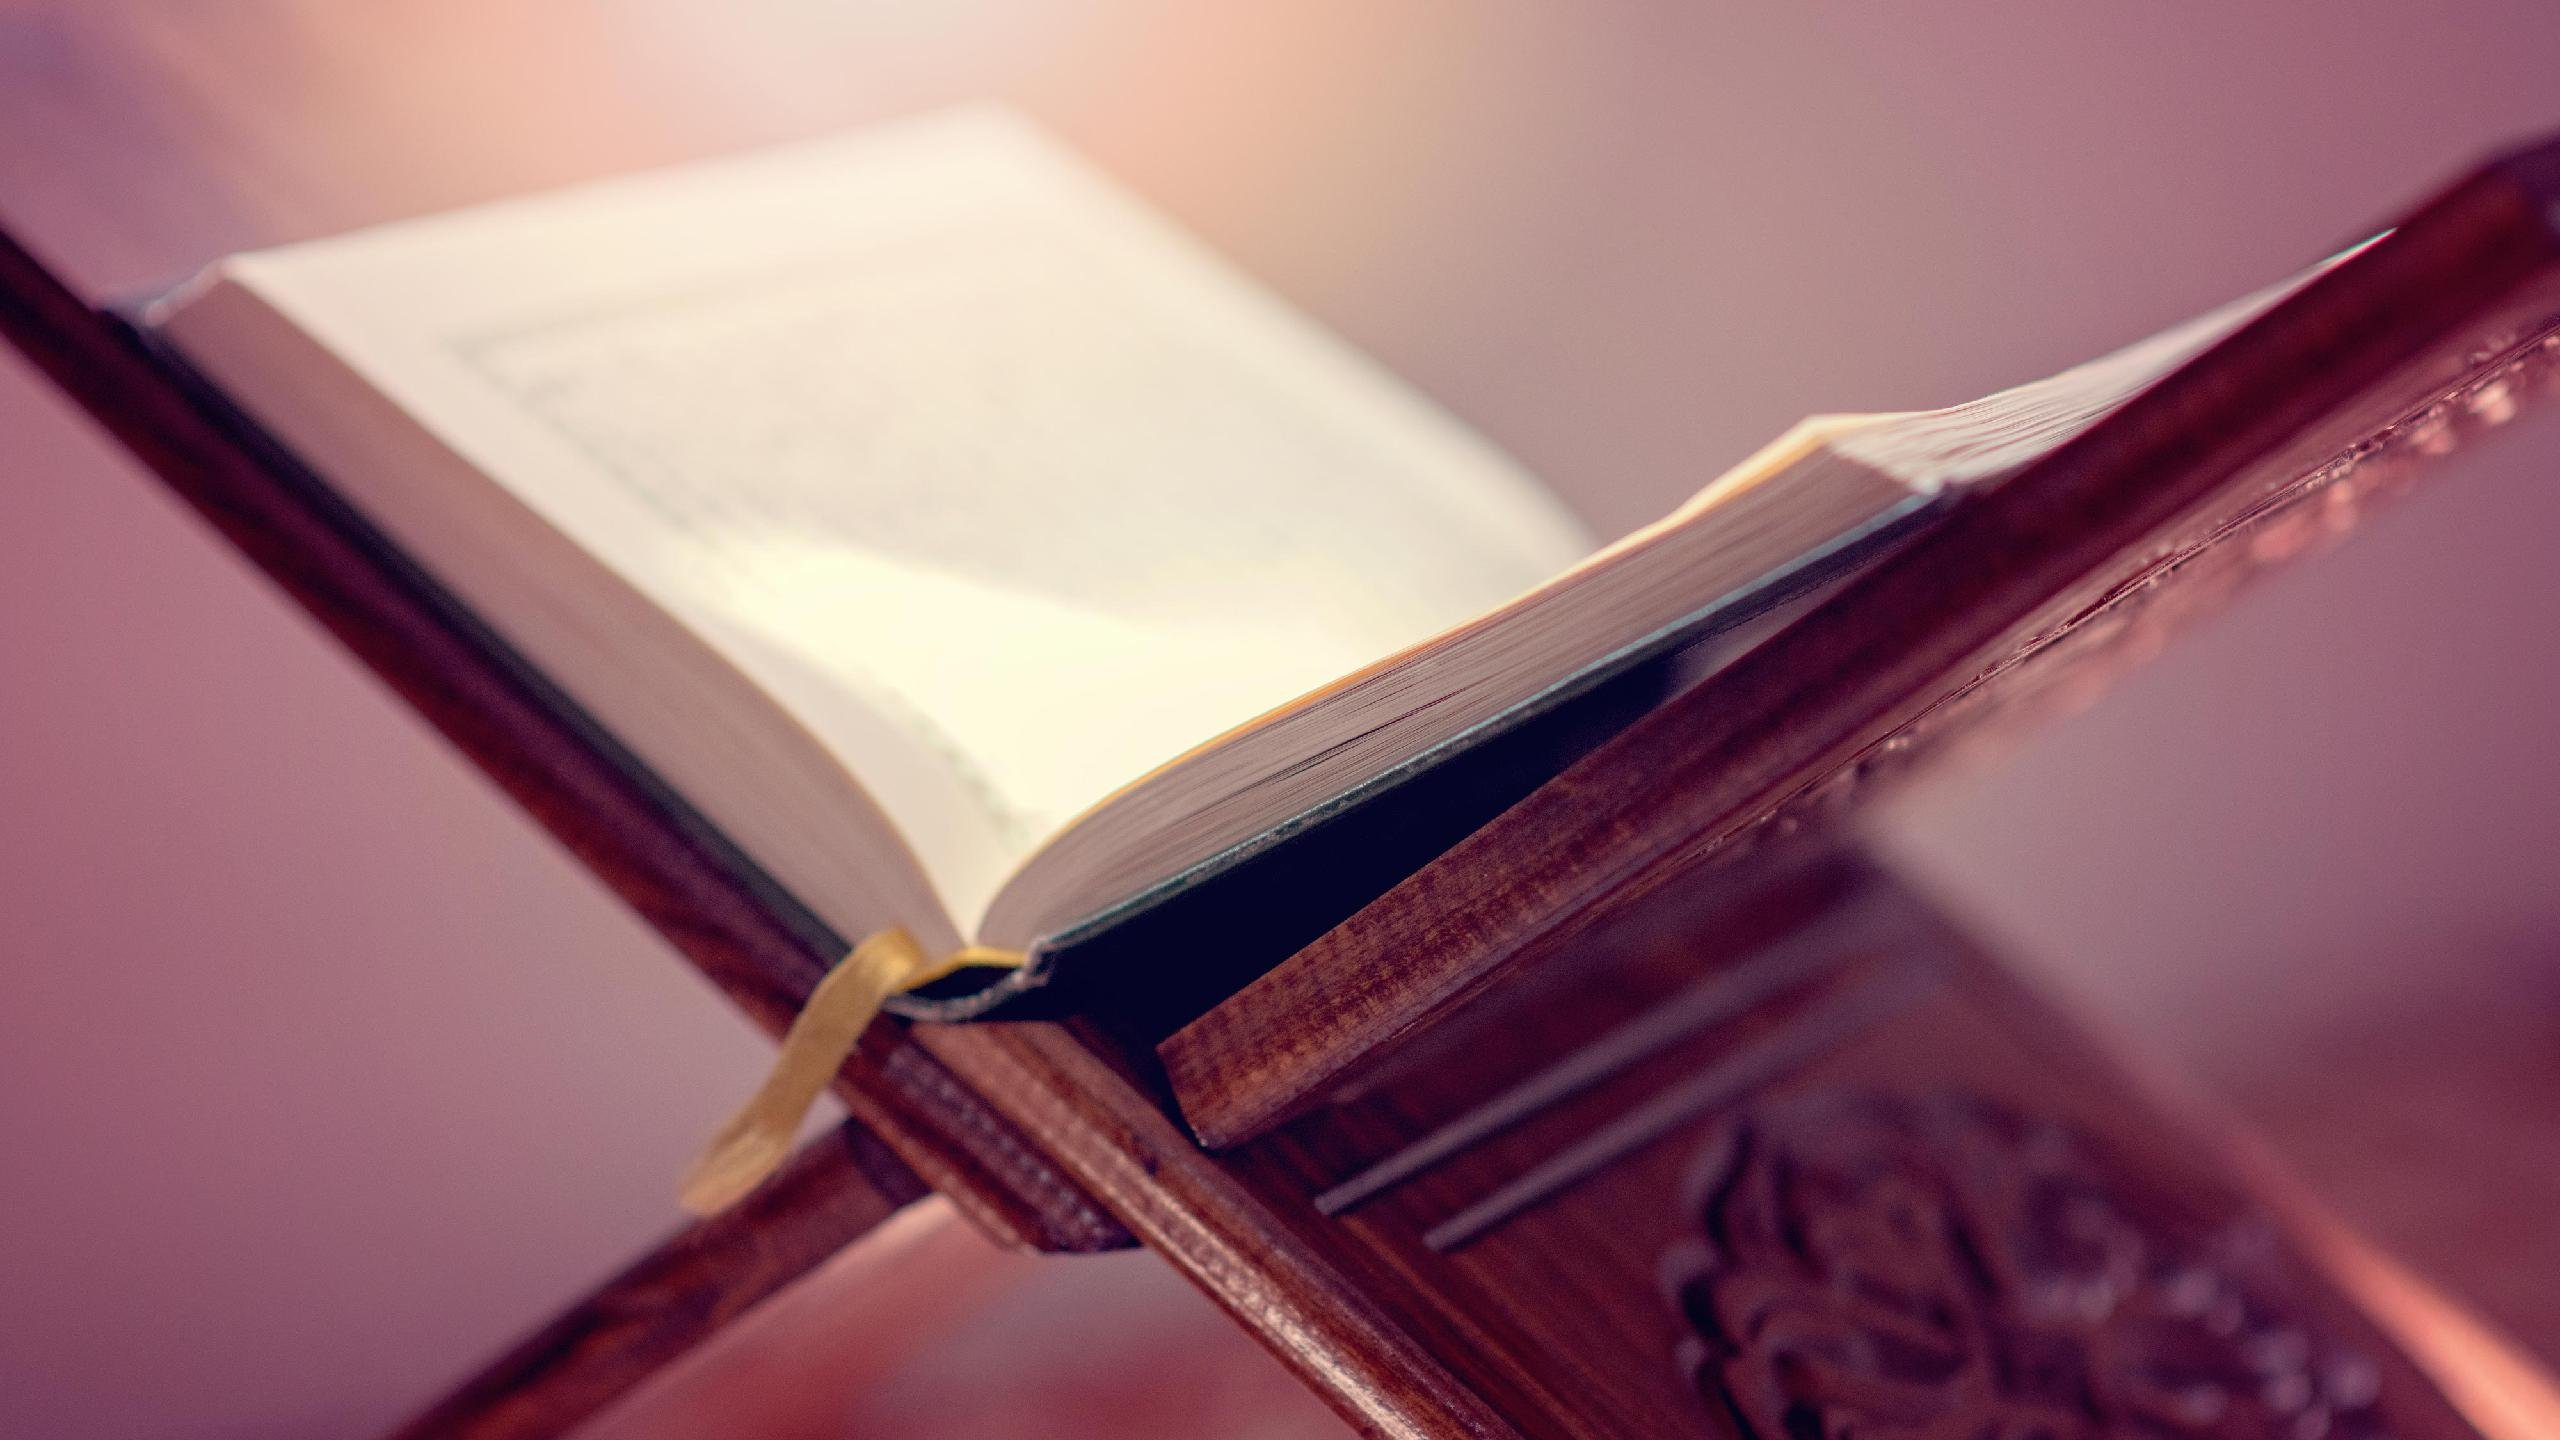 Introduction to I'jāz al-Qur'ān: The Miraculous Nature of the Qur'an